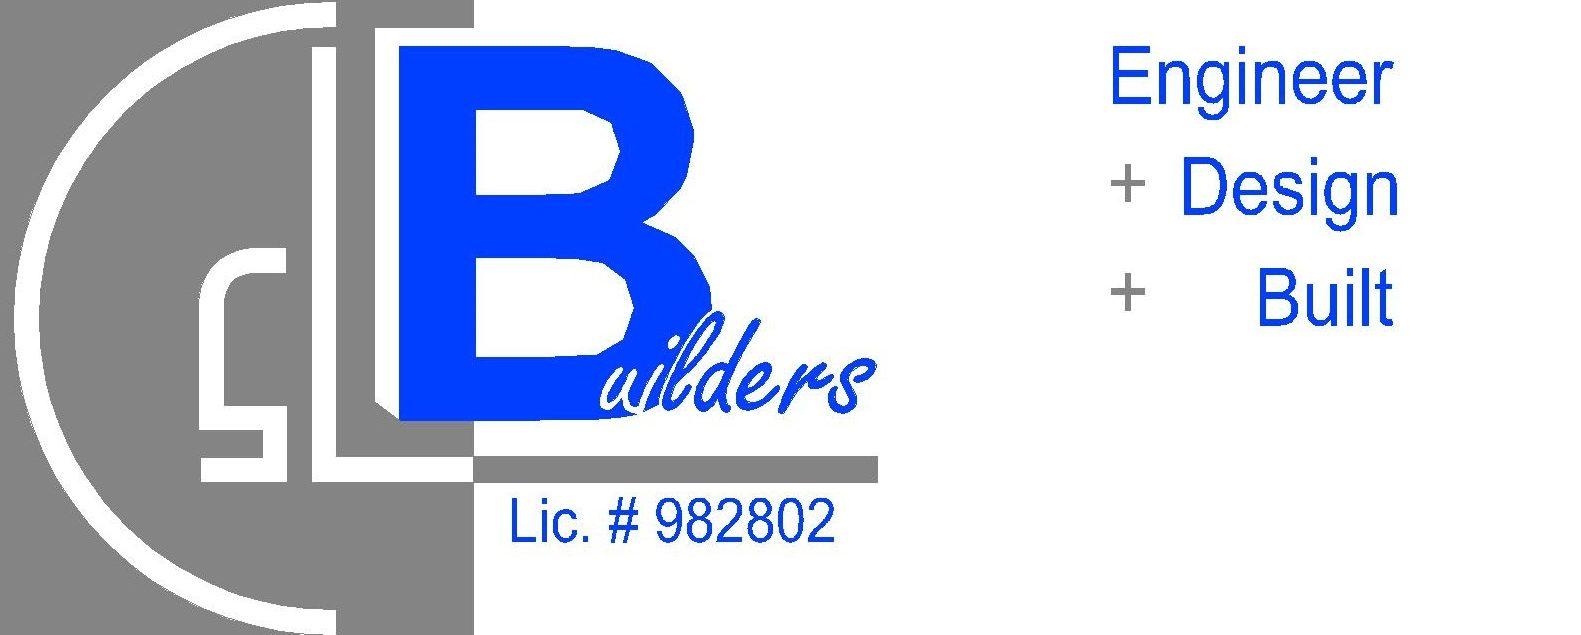 CSL Builders